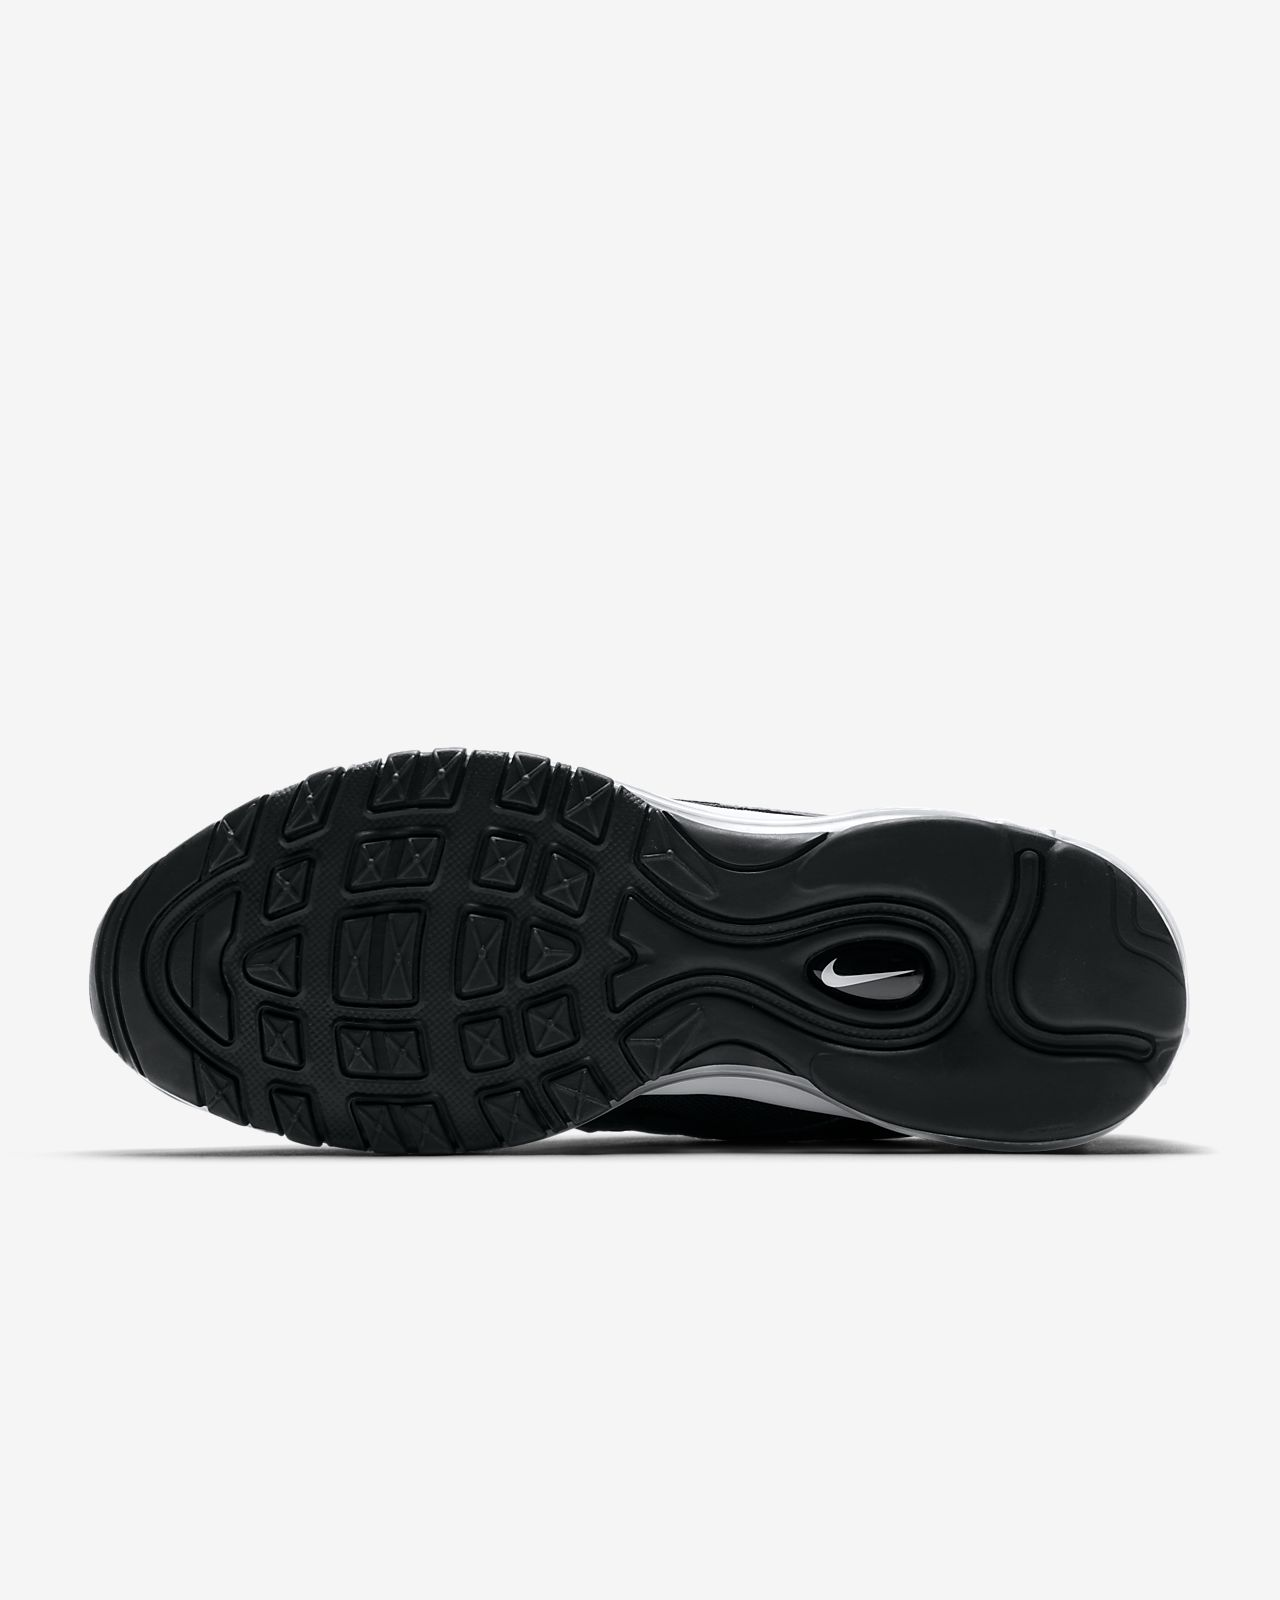 NIKE AIR MAX 97 Sneaker Damen Schuh Schwarz 921733 011 EUR